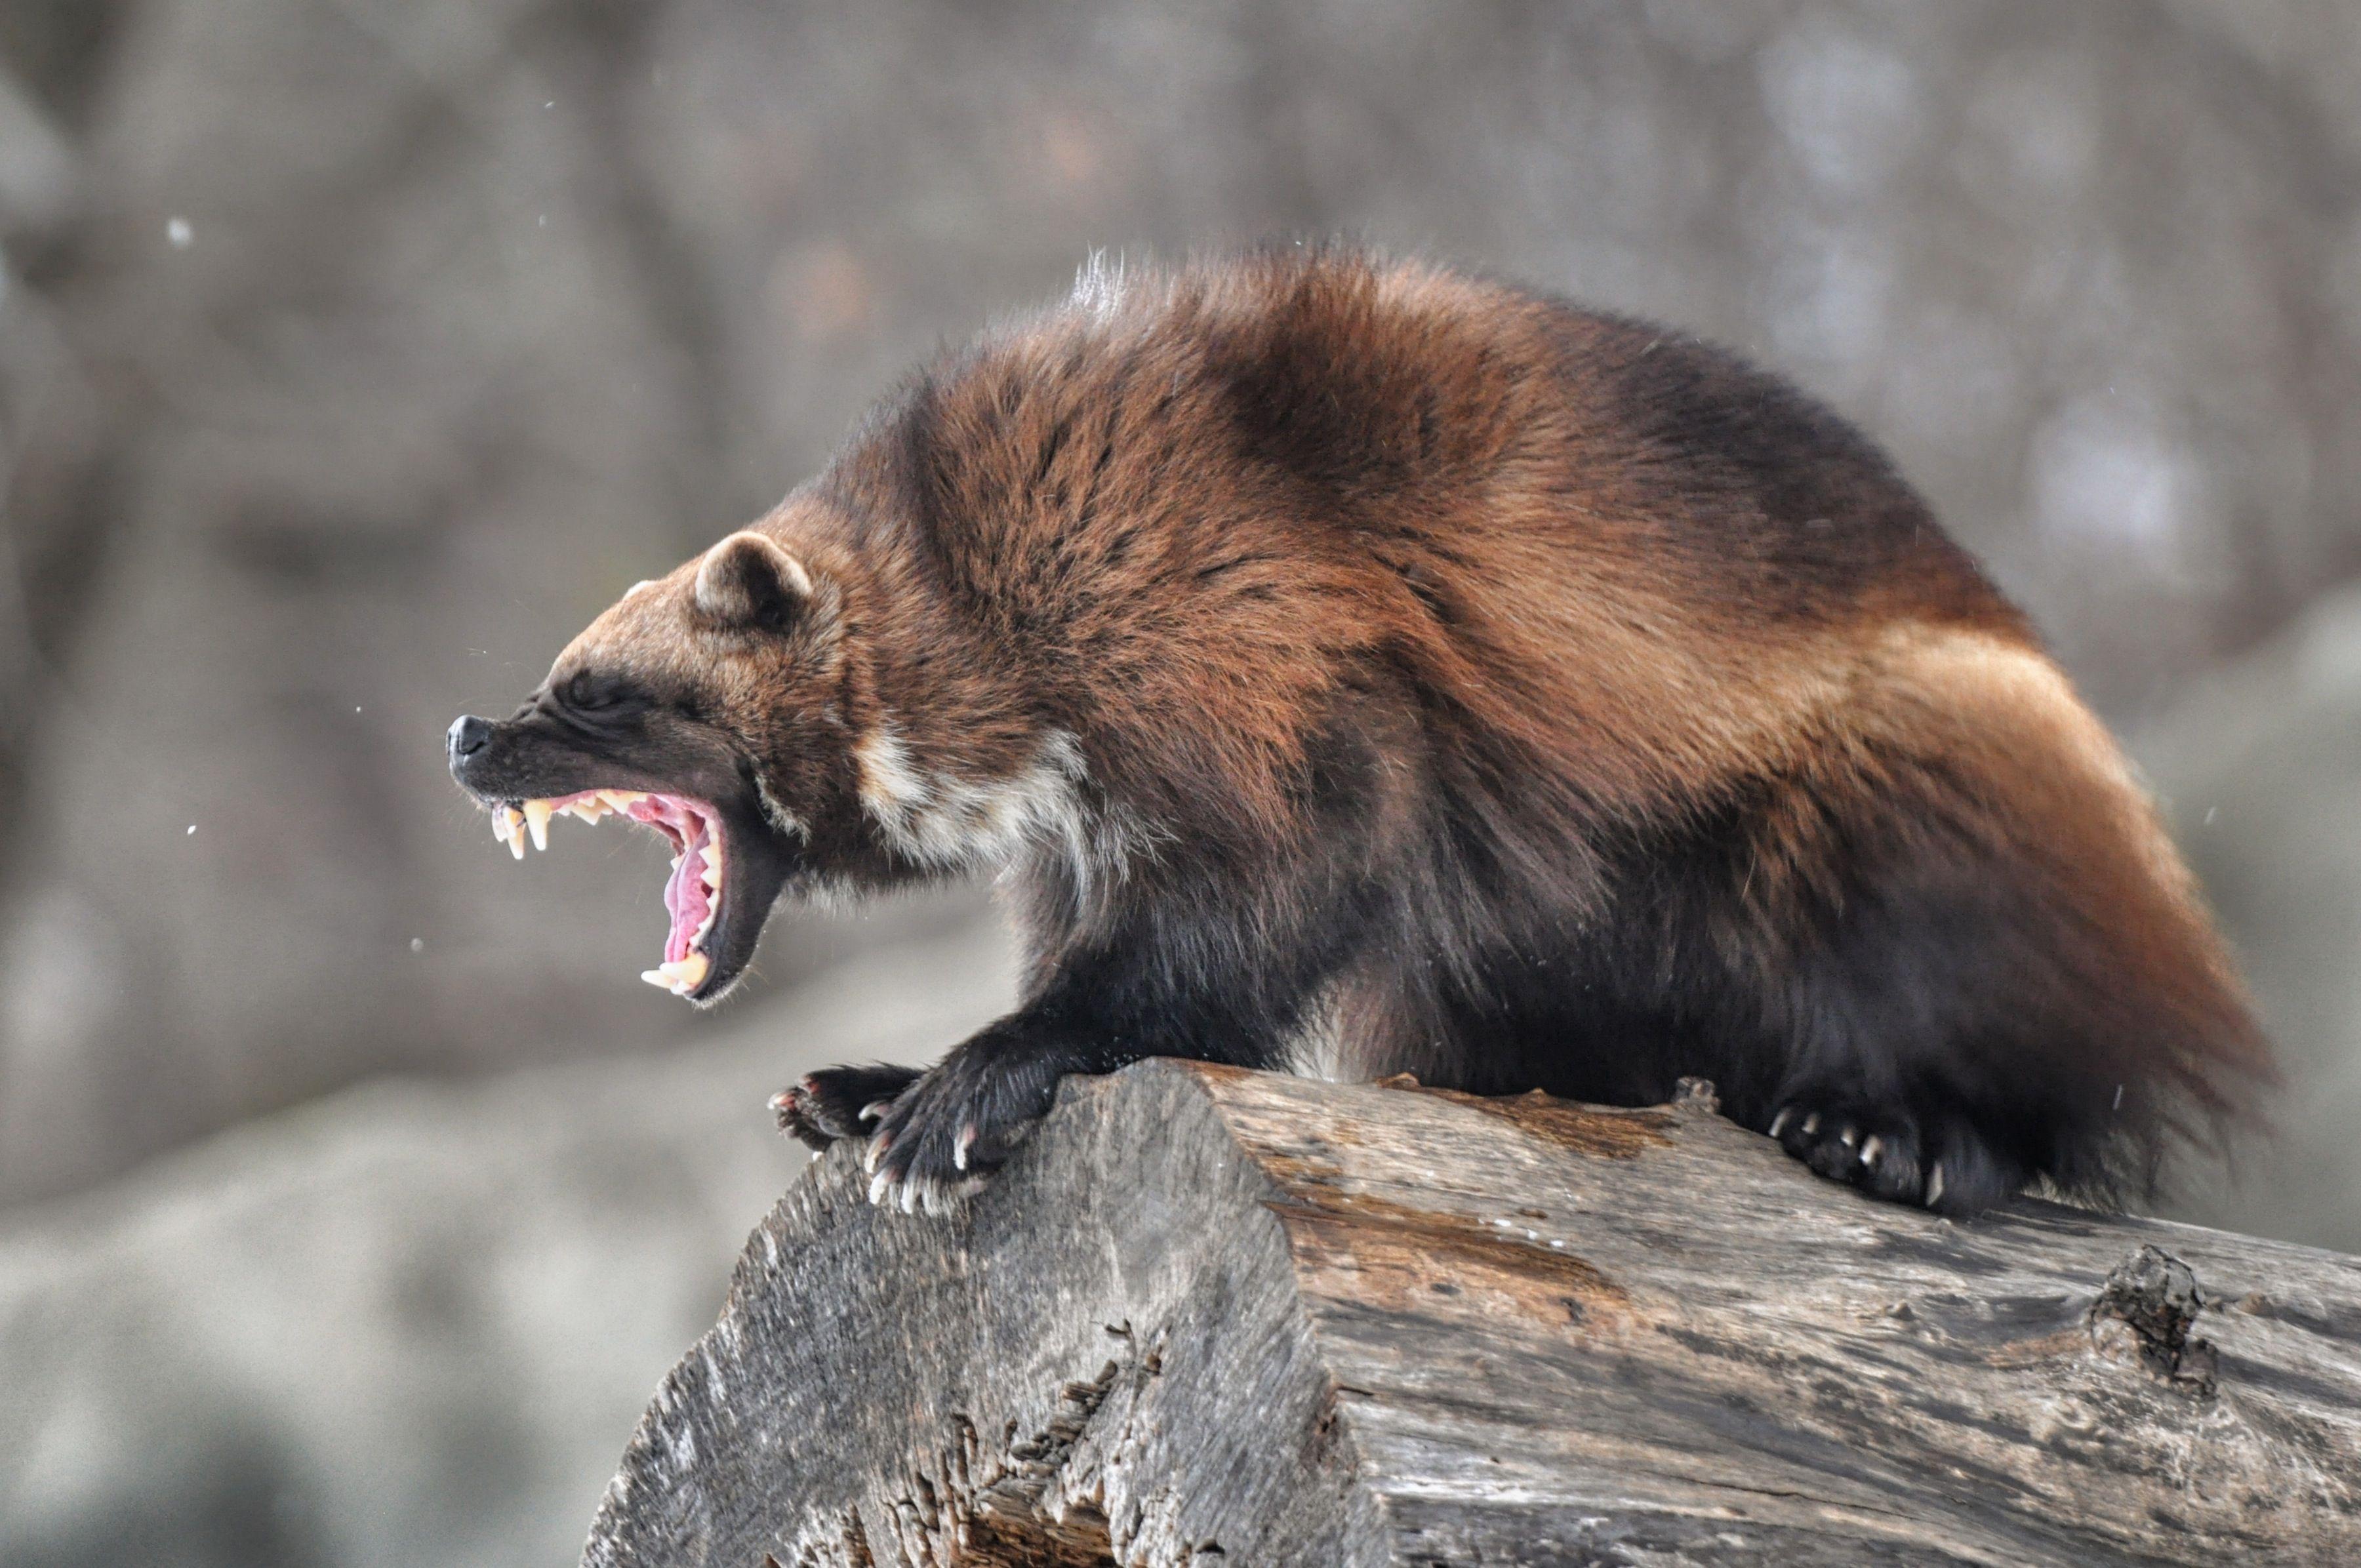 Wolverine   Animals   Pinterest   Wolverine animal, Animal and Google search